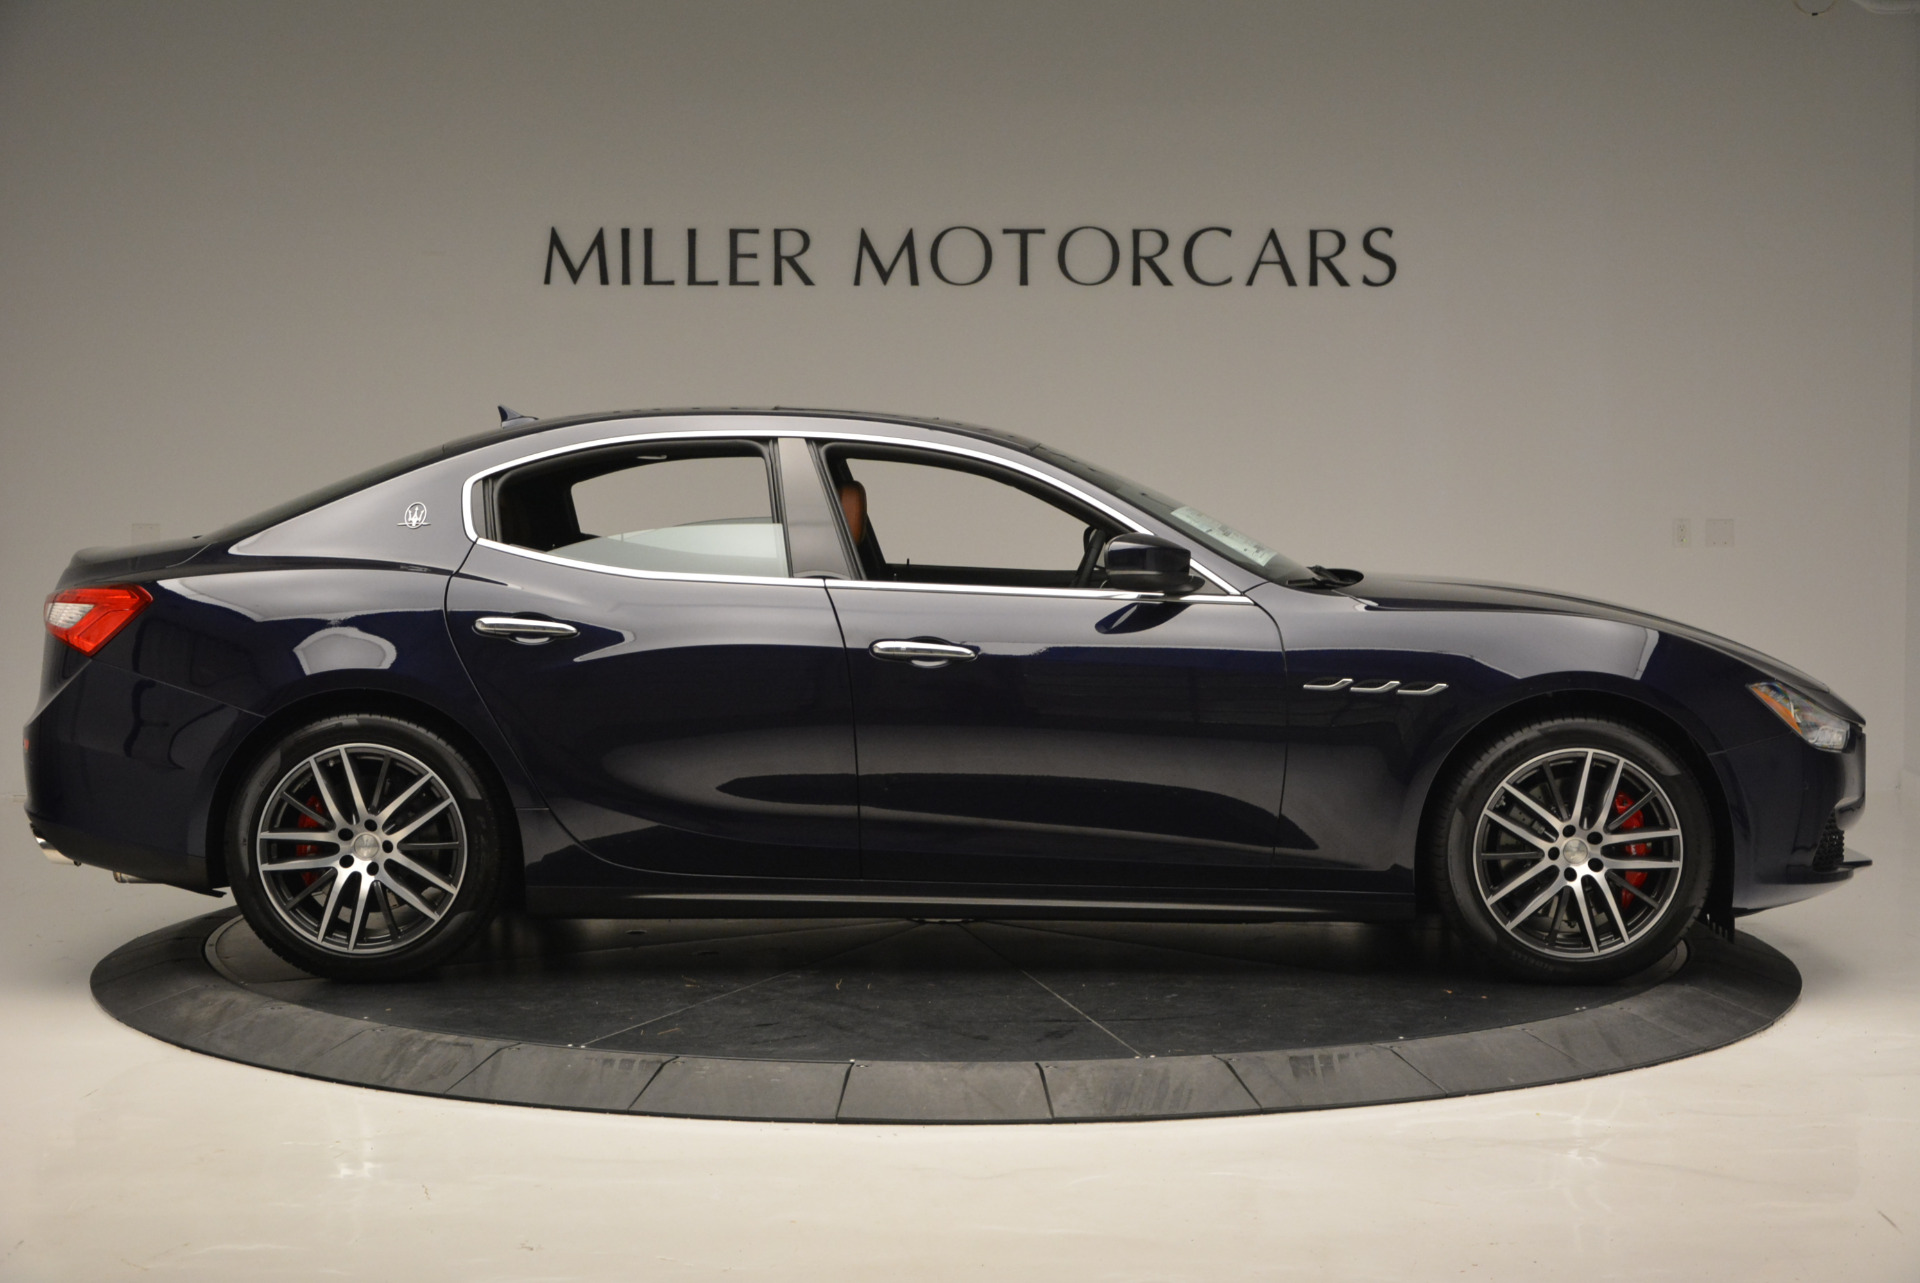 Used 2017 Maserati Ghibli S Q4 - EX Loaner For Sale In Greenwich, CT 568_p9